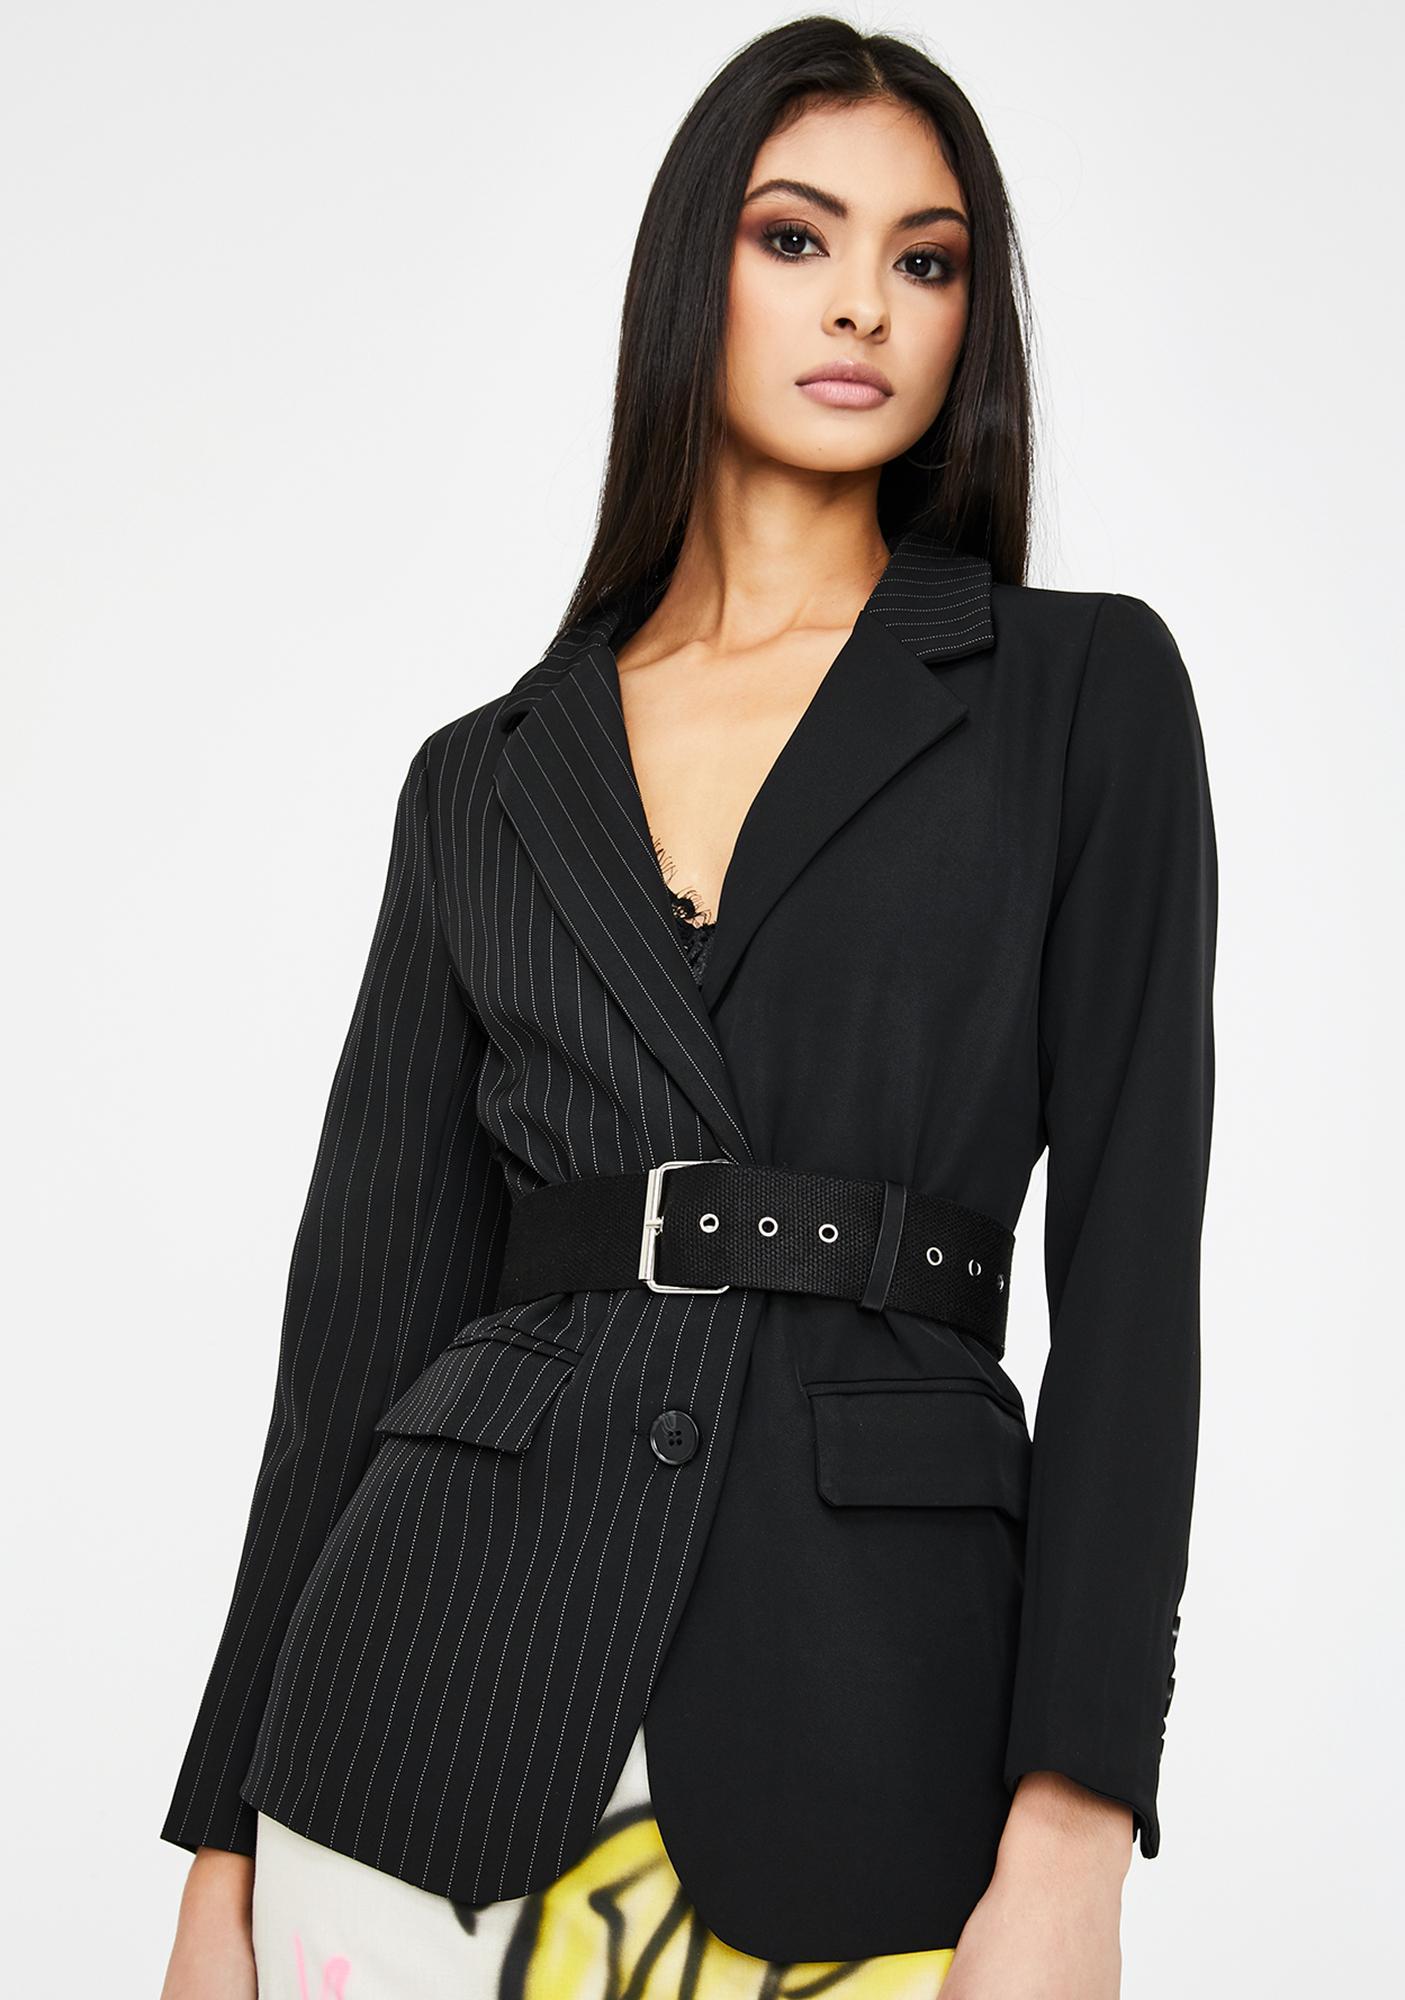 Alzang Black Pinstripe Buckle Blazer